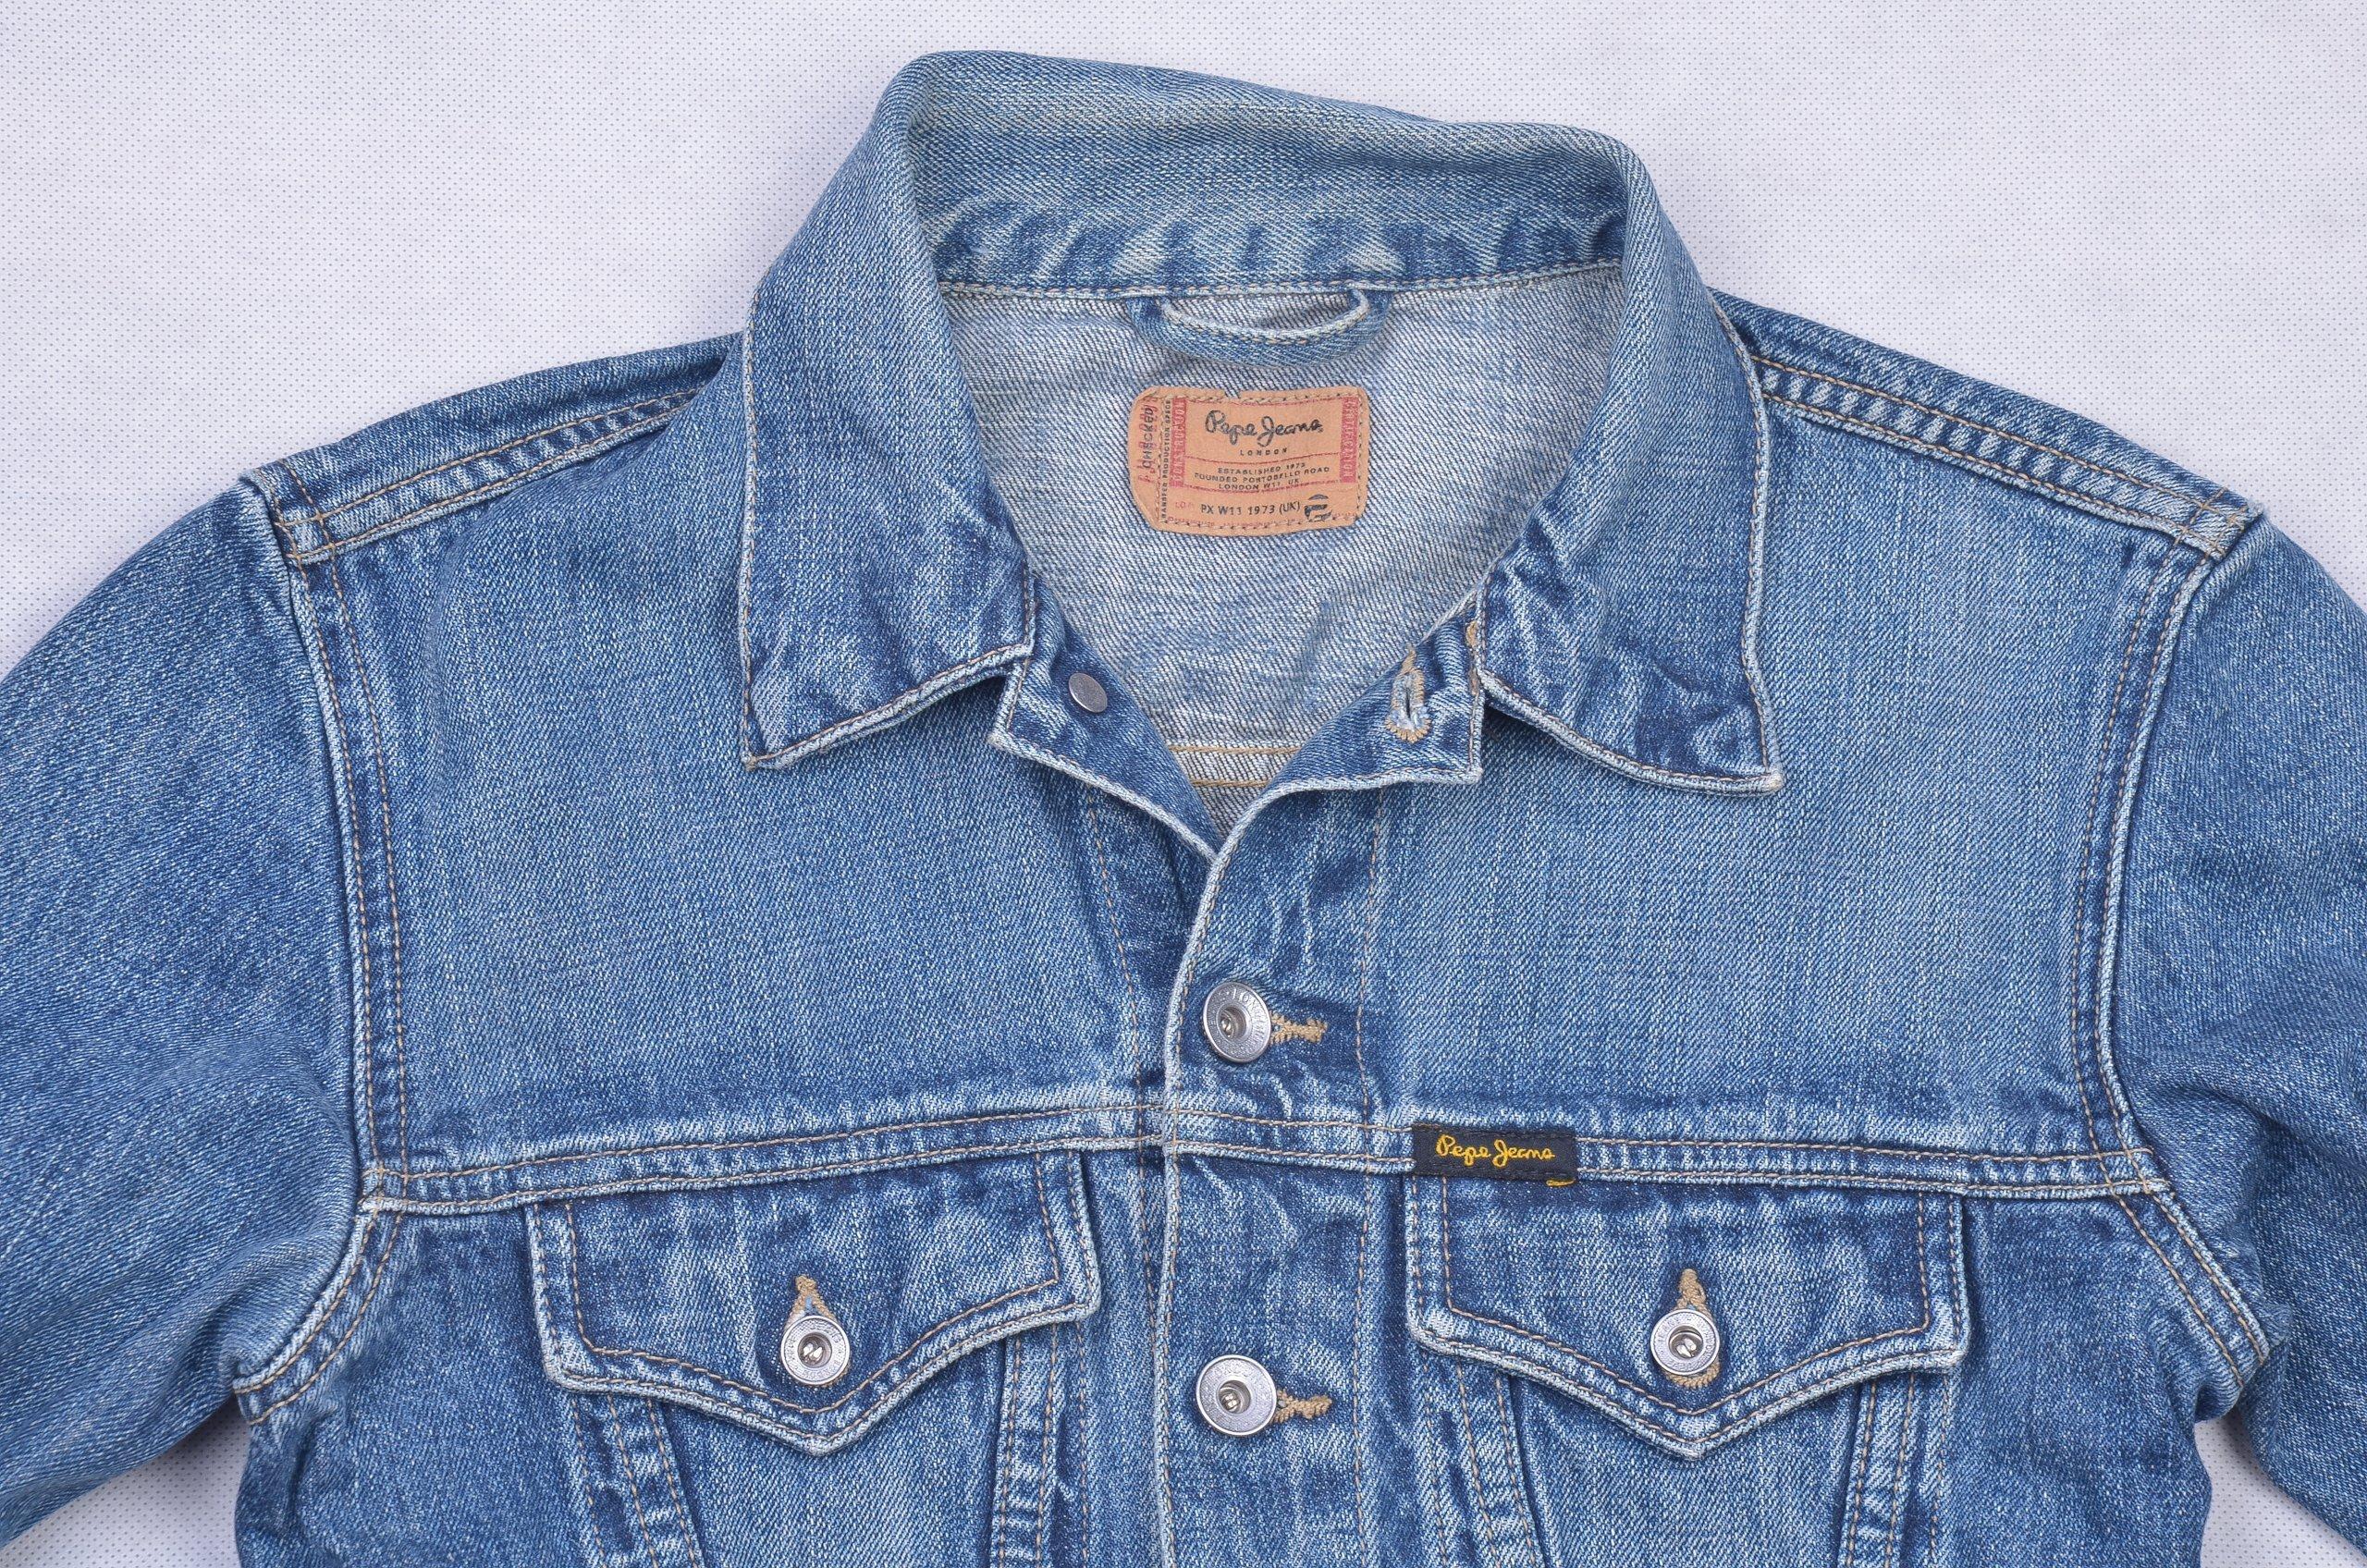 c7f3e1618b4bb Pepe Jeans LONDON KURTKA KATANA JEANSOWA TRUCKER M - 7384019076 ...